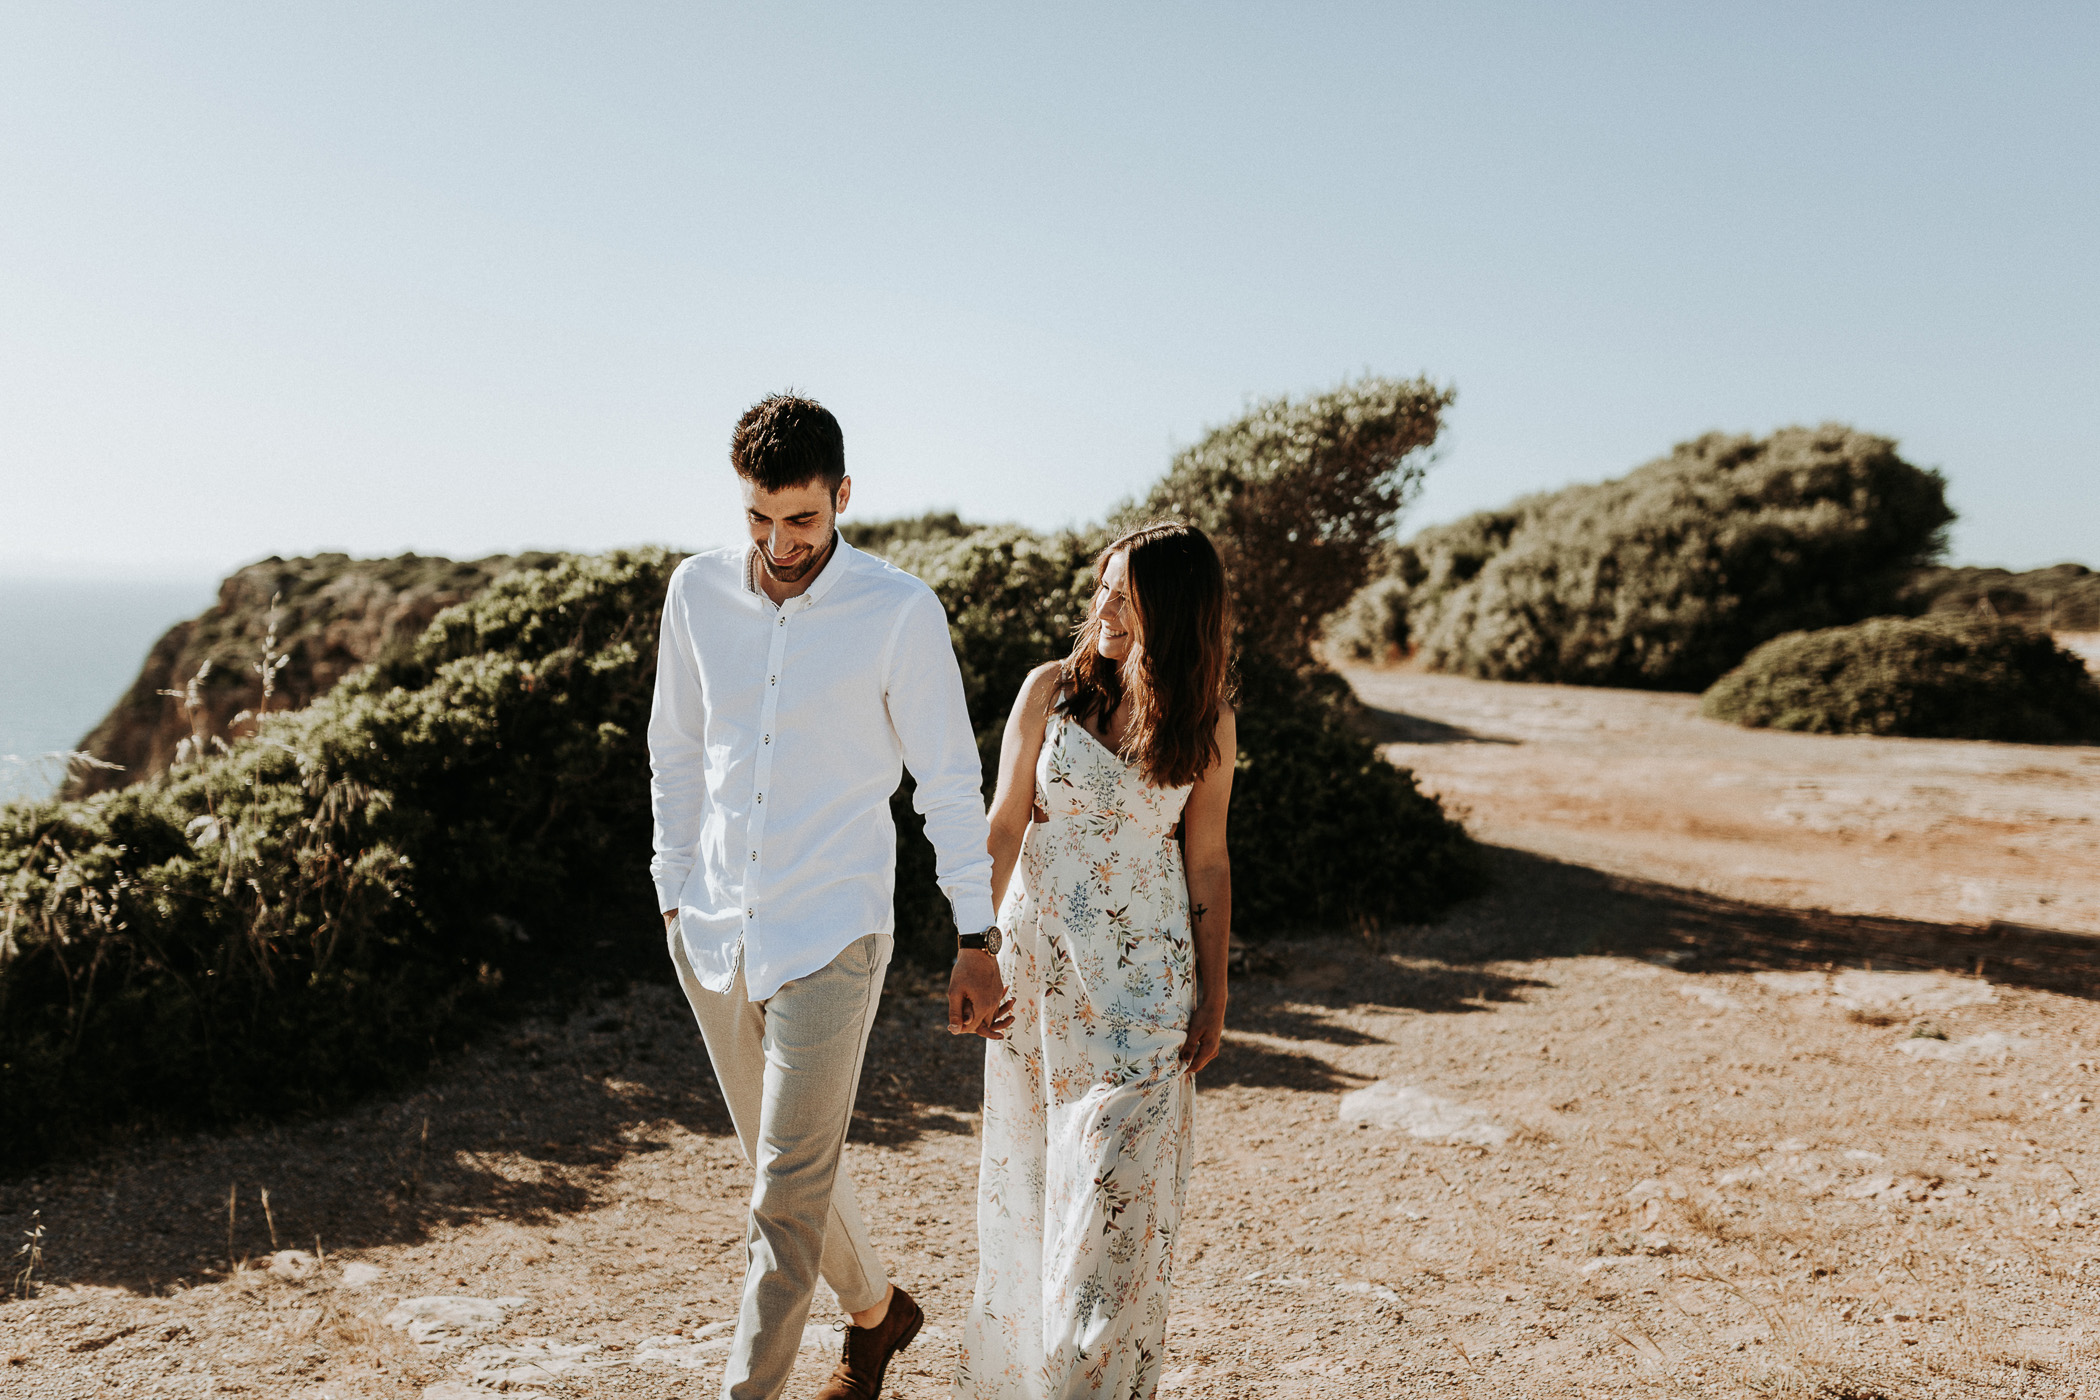 DanielaMarquardtPhotography_wedding_elopement_mallorca_spain_calapi_palma_lauraandtoni_11